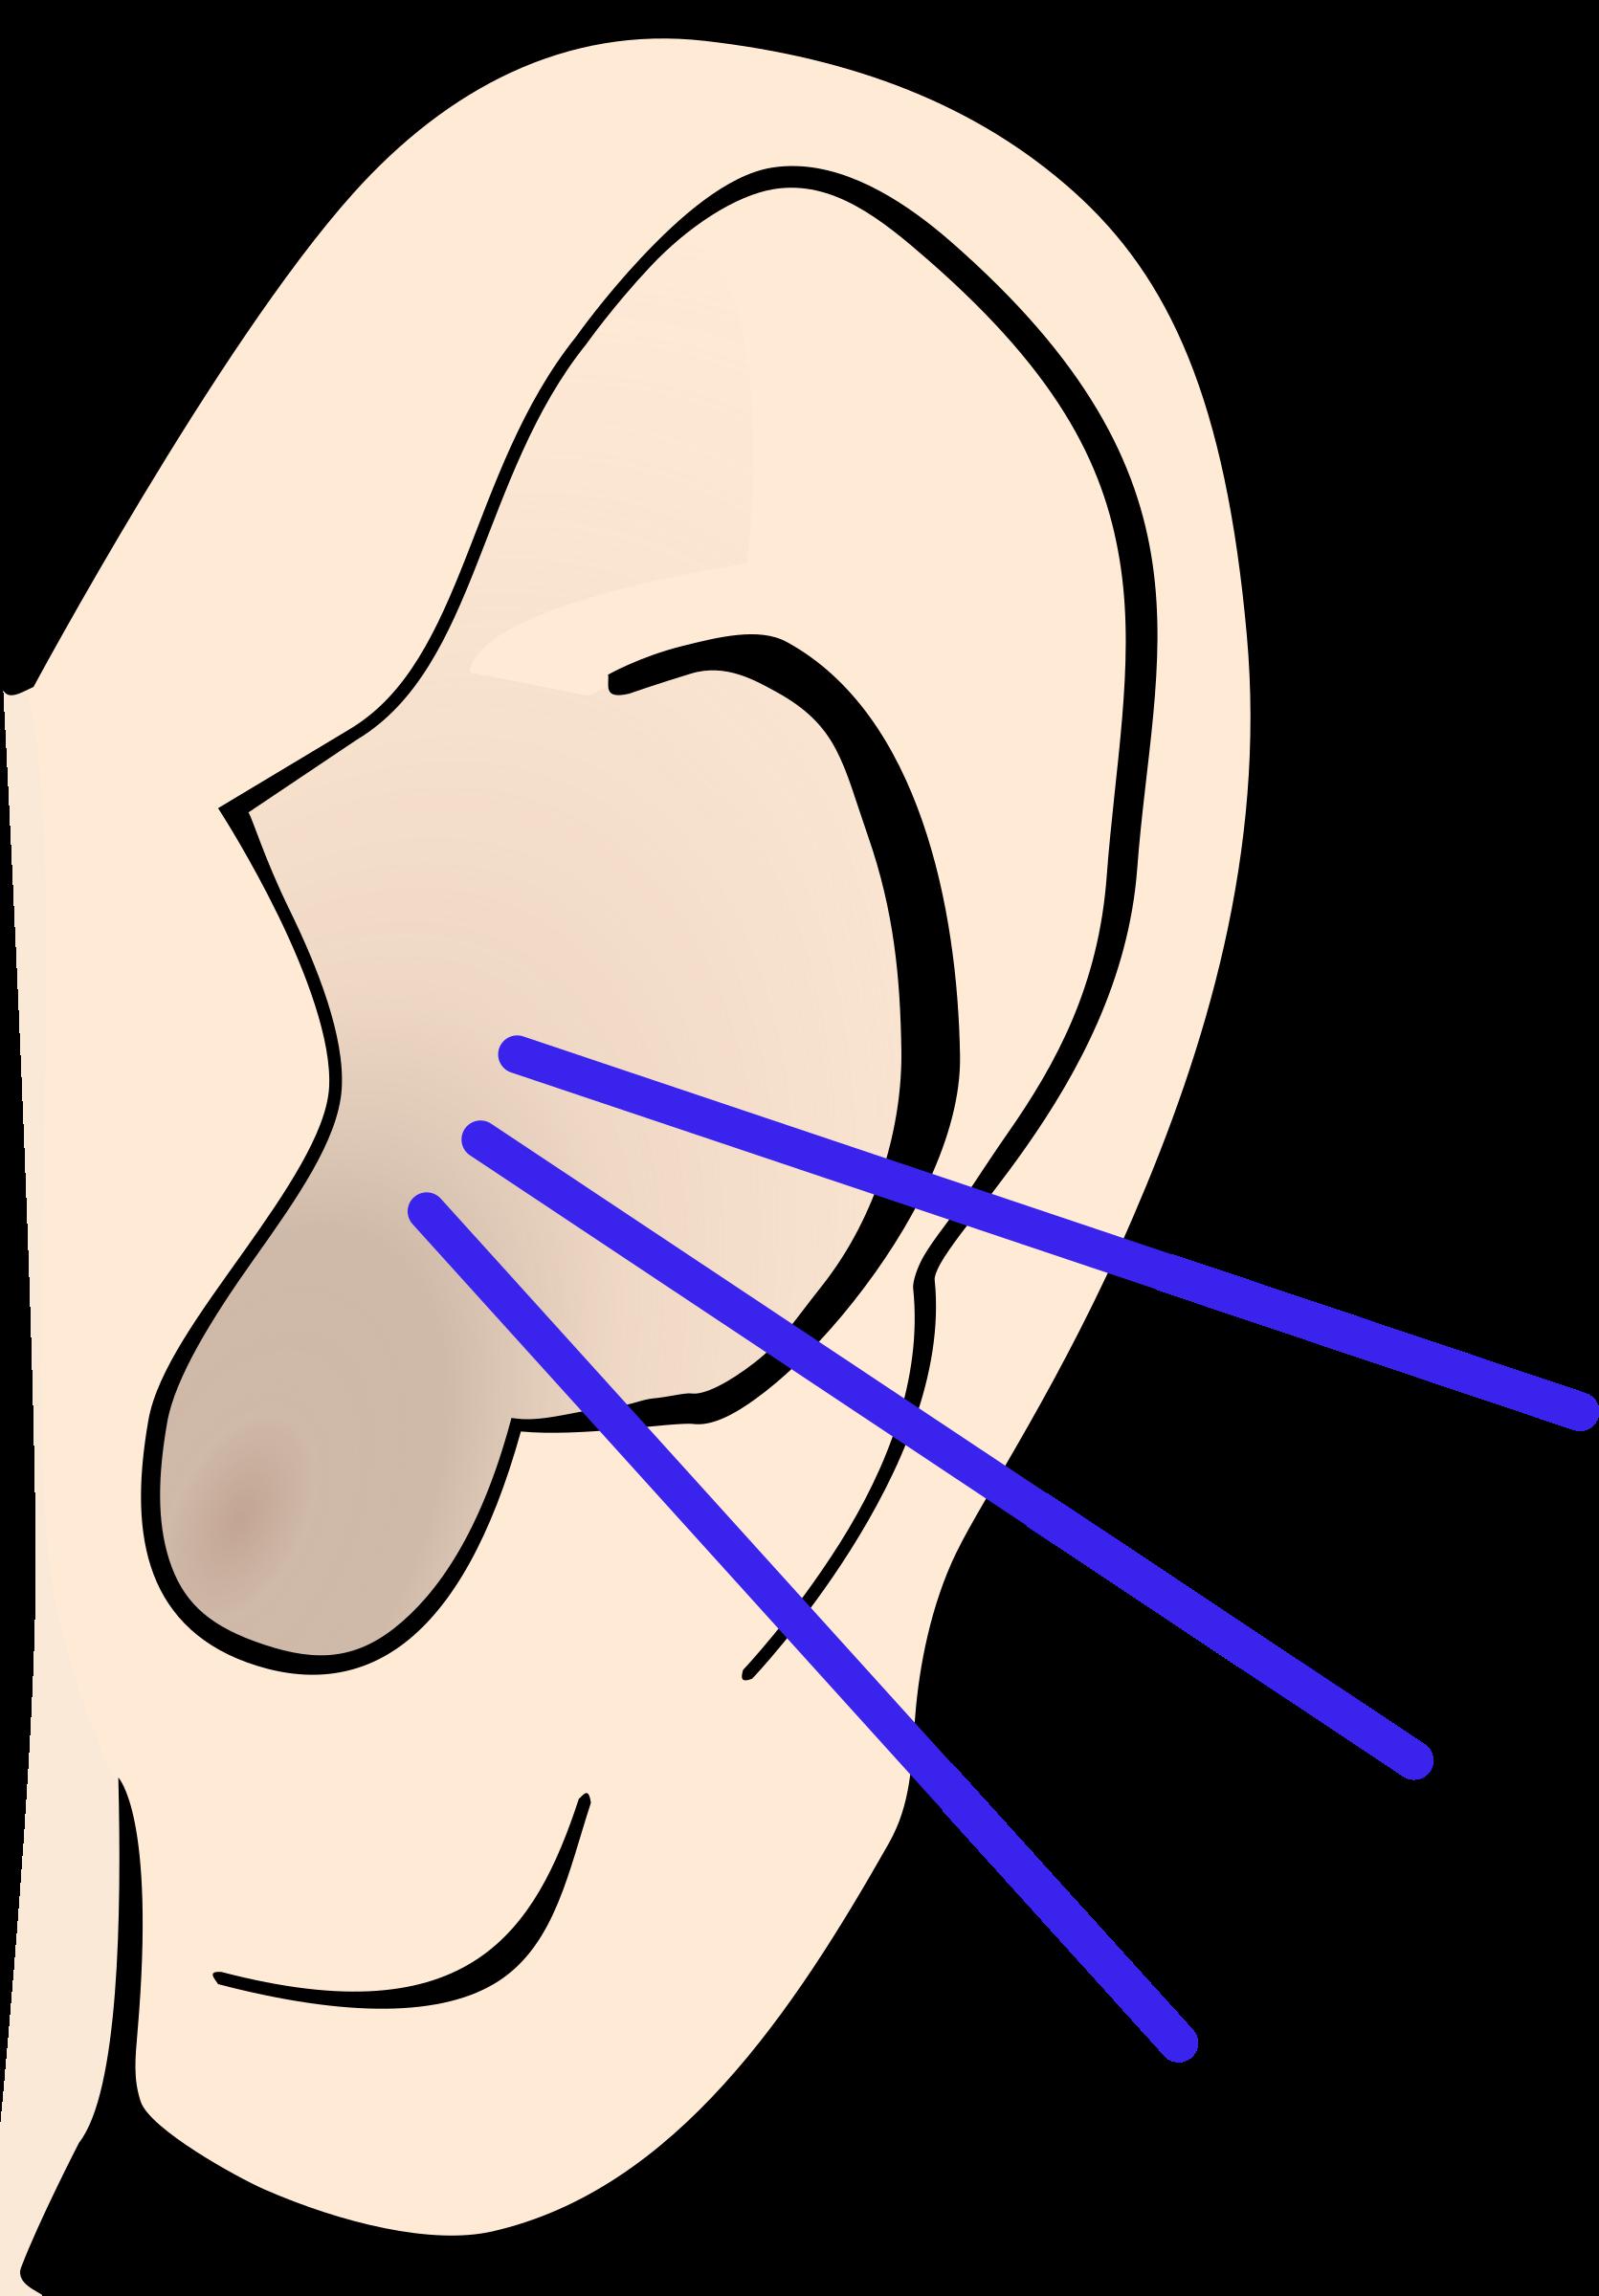 Png ears listening transparent. Nose clipart sensory organ